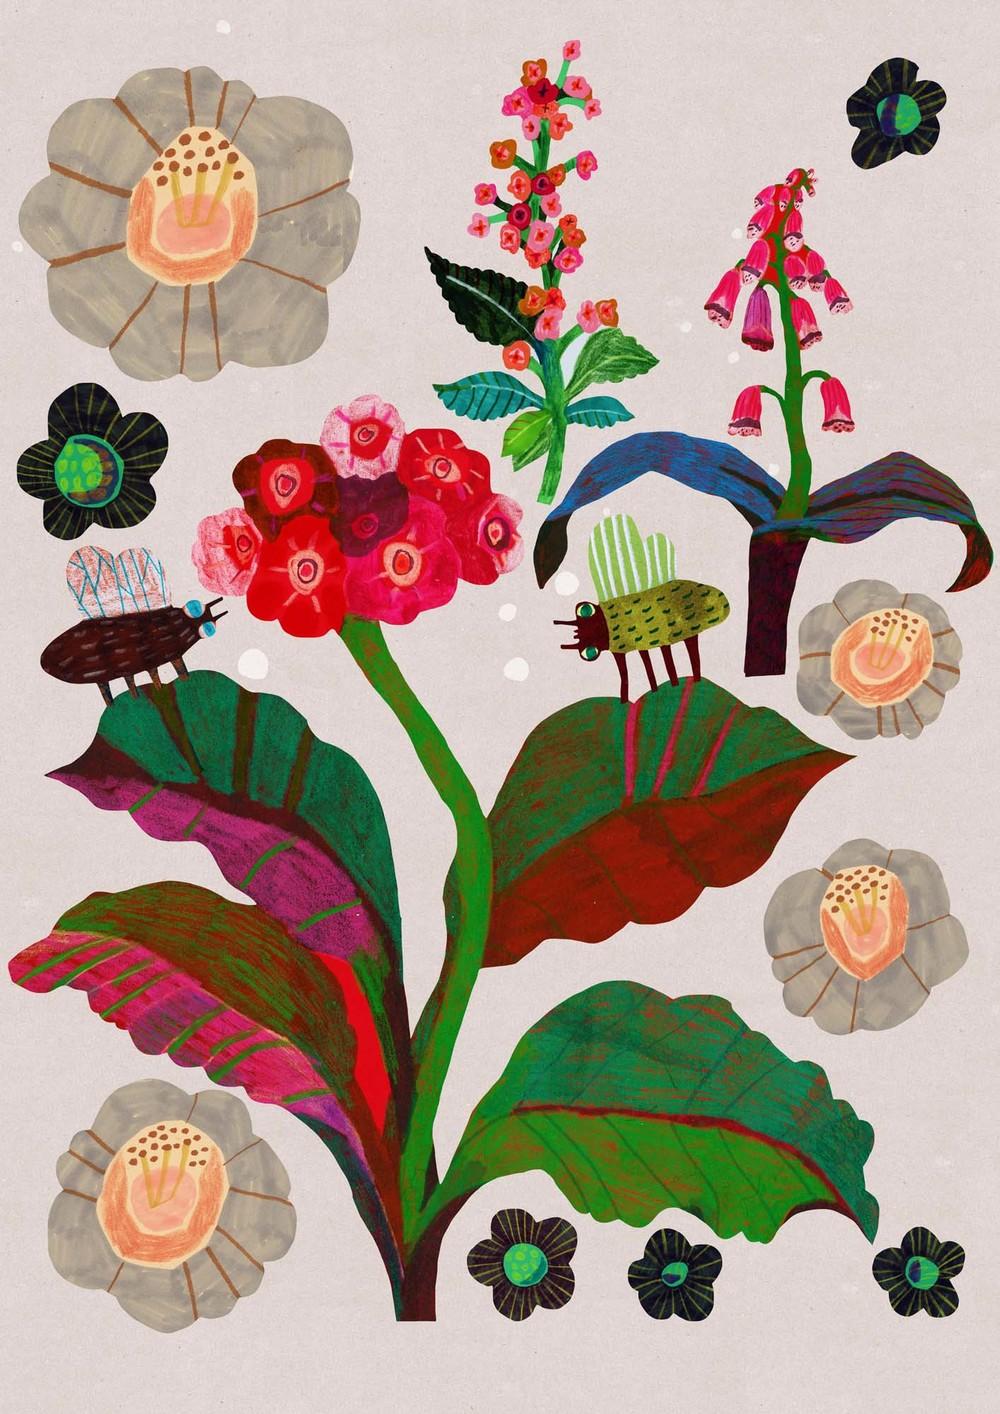 Monika Forsberg's funky Kew print